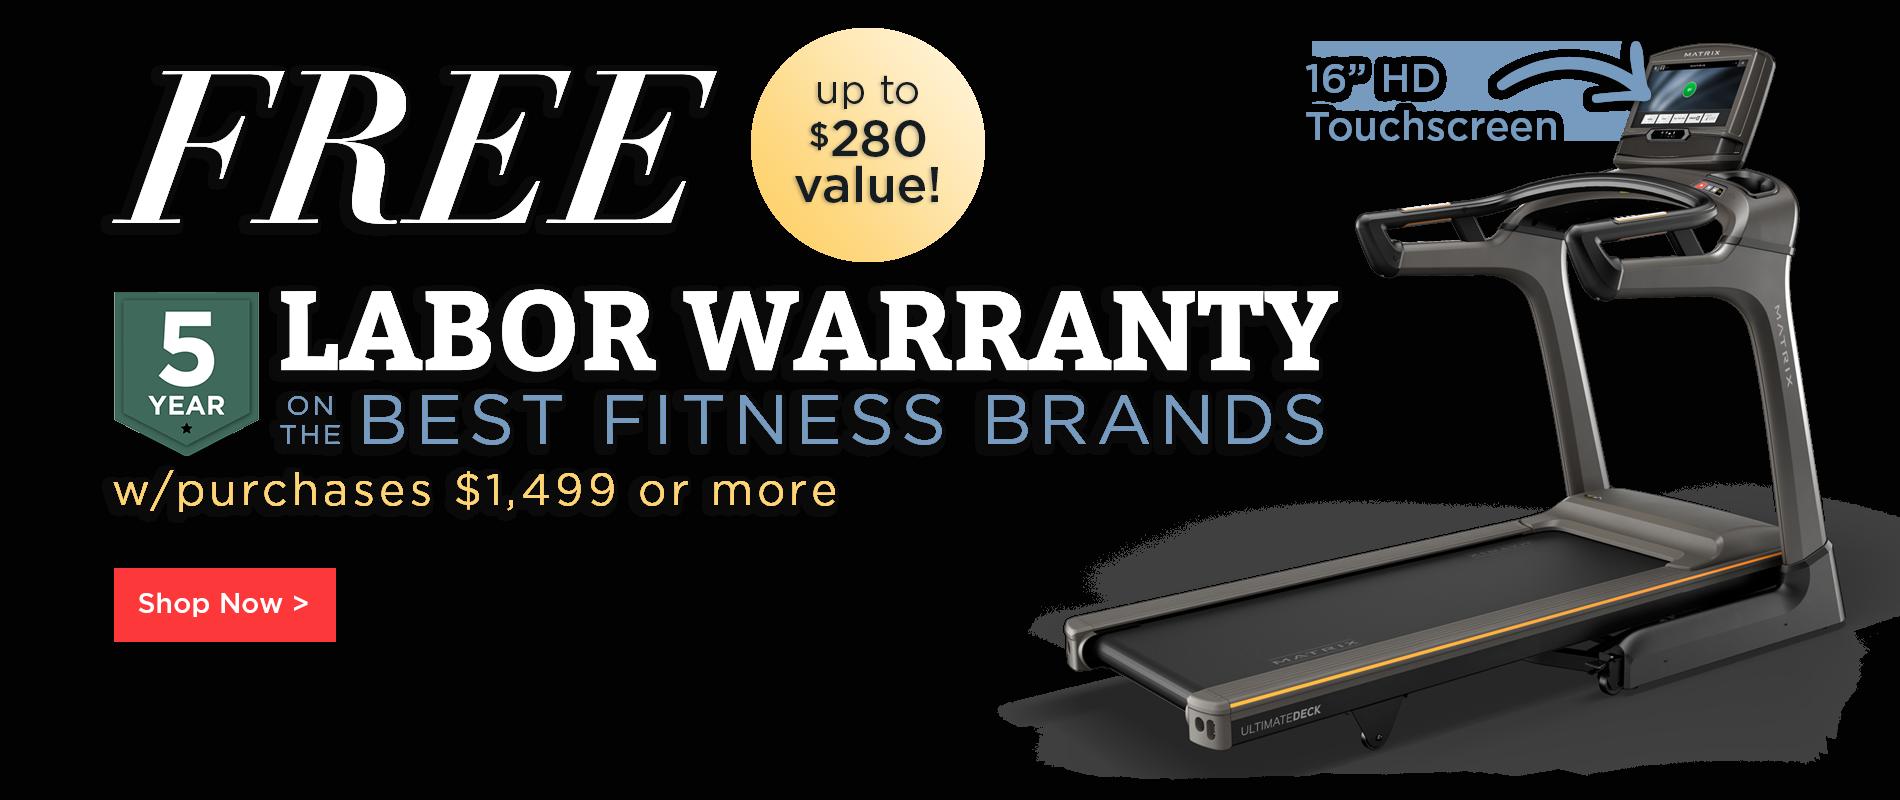 de3c1253f5 Best Home Fitness Equipment Treadmill Johnson